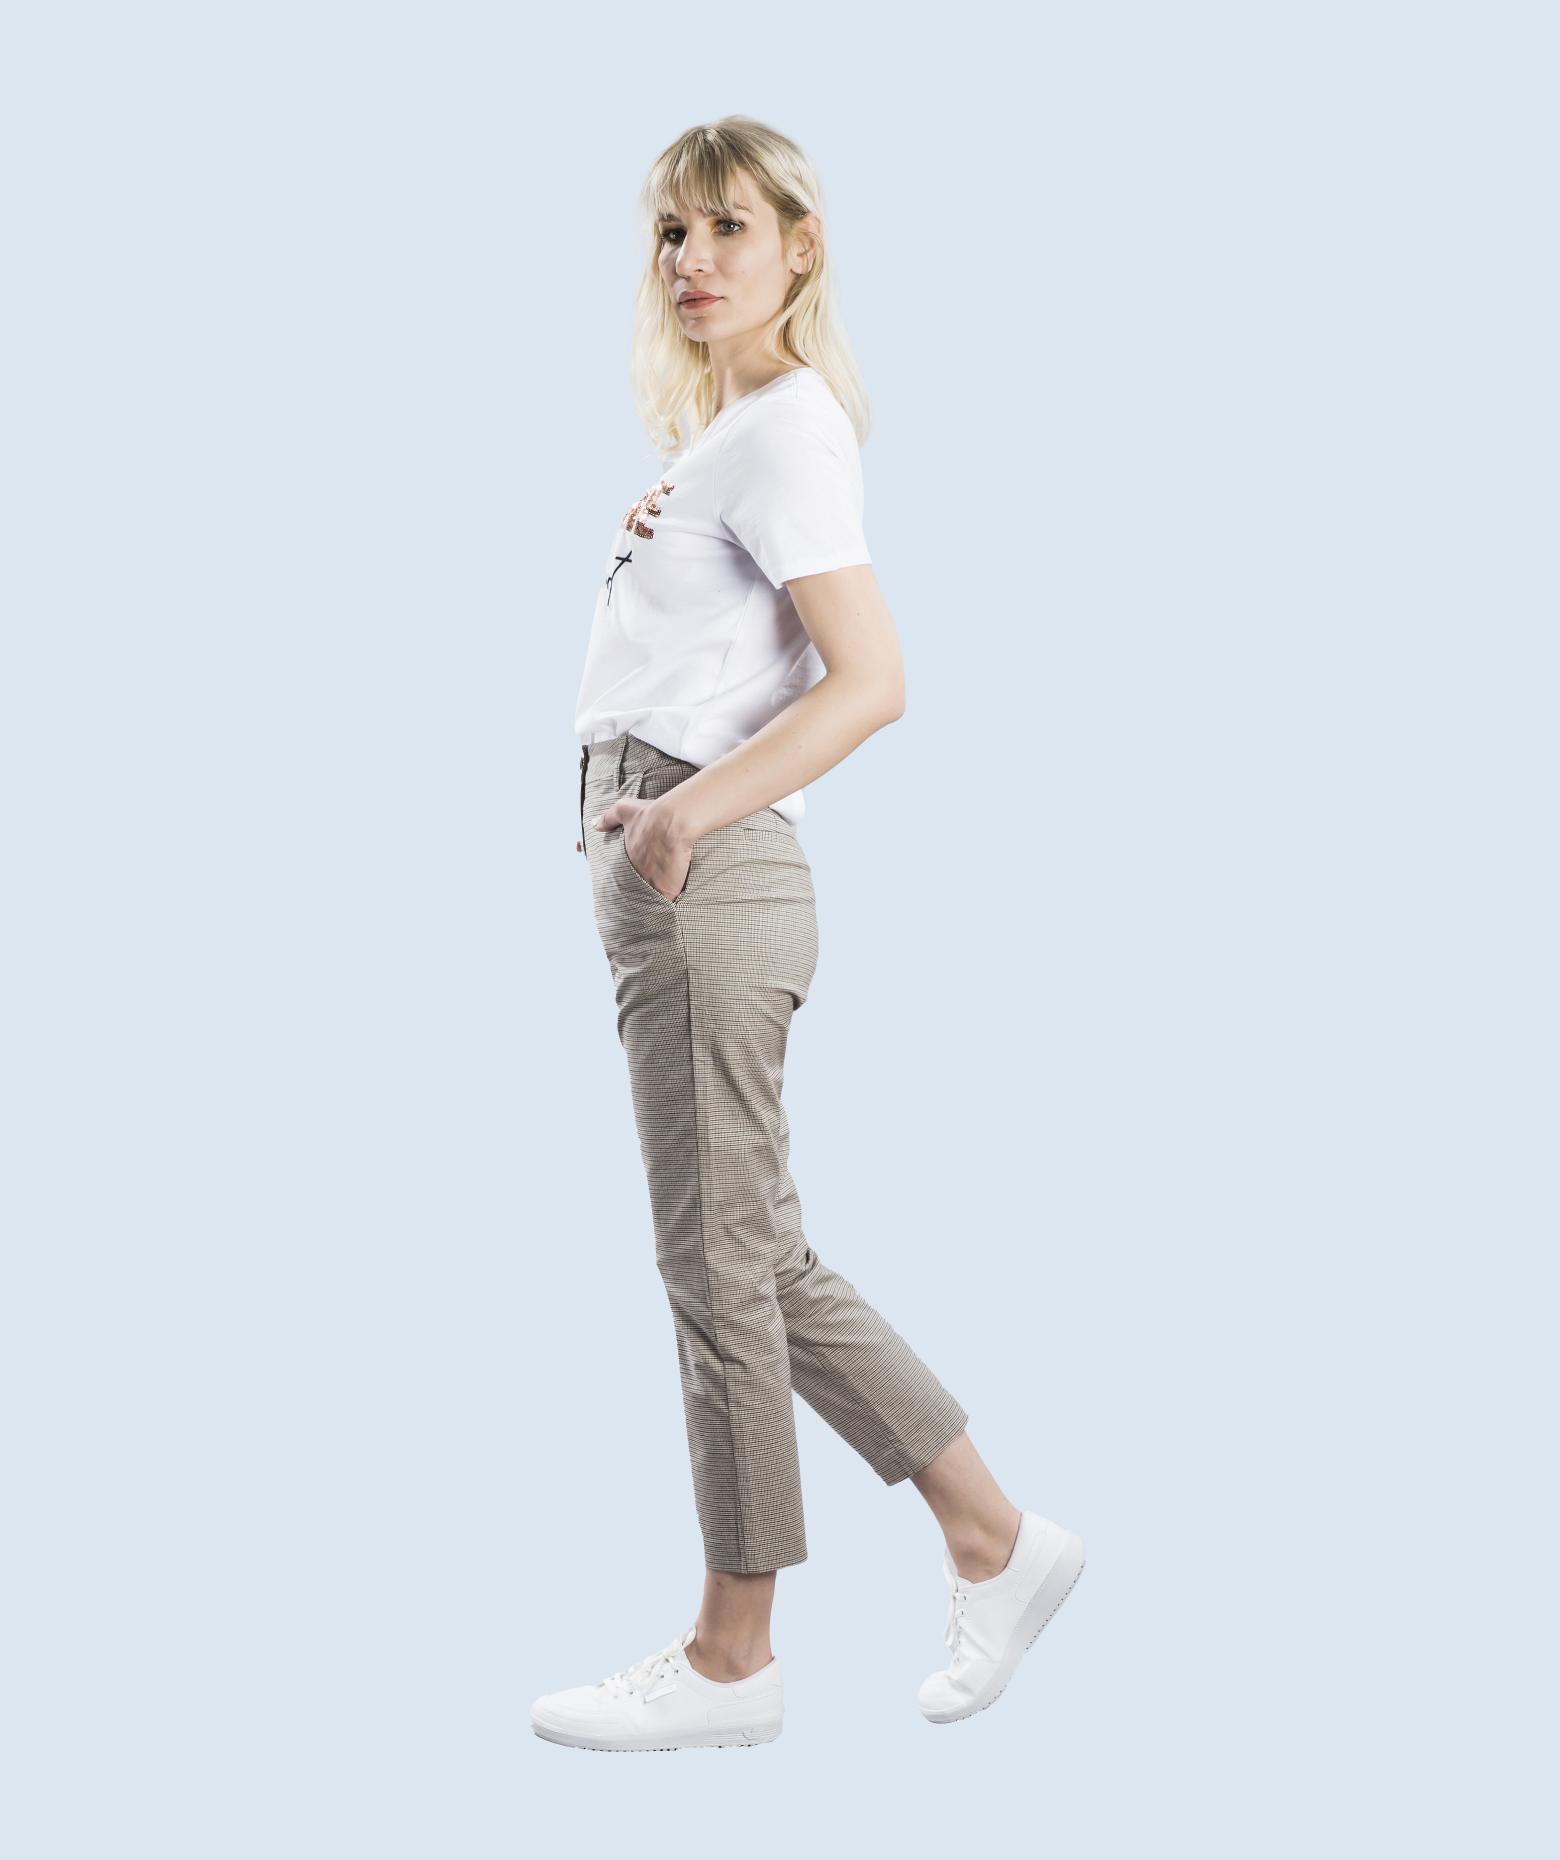 Eli Klasik Pantalon: Meisies'21